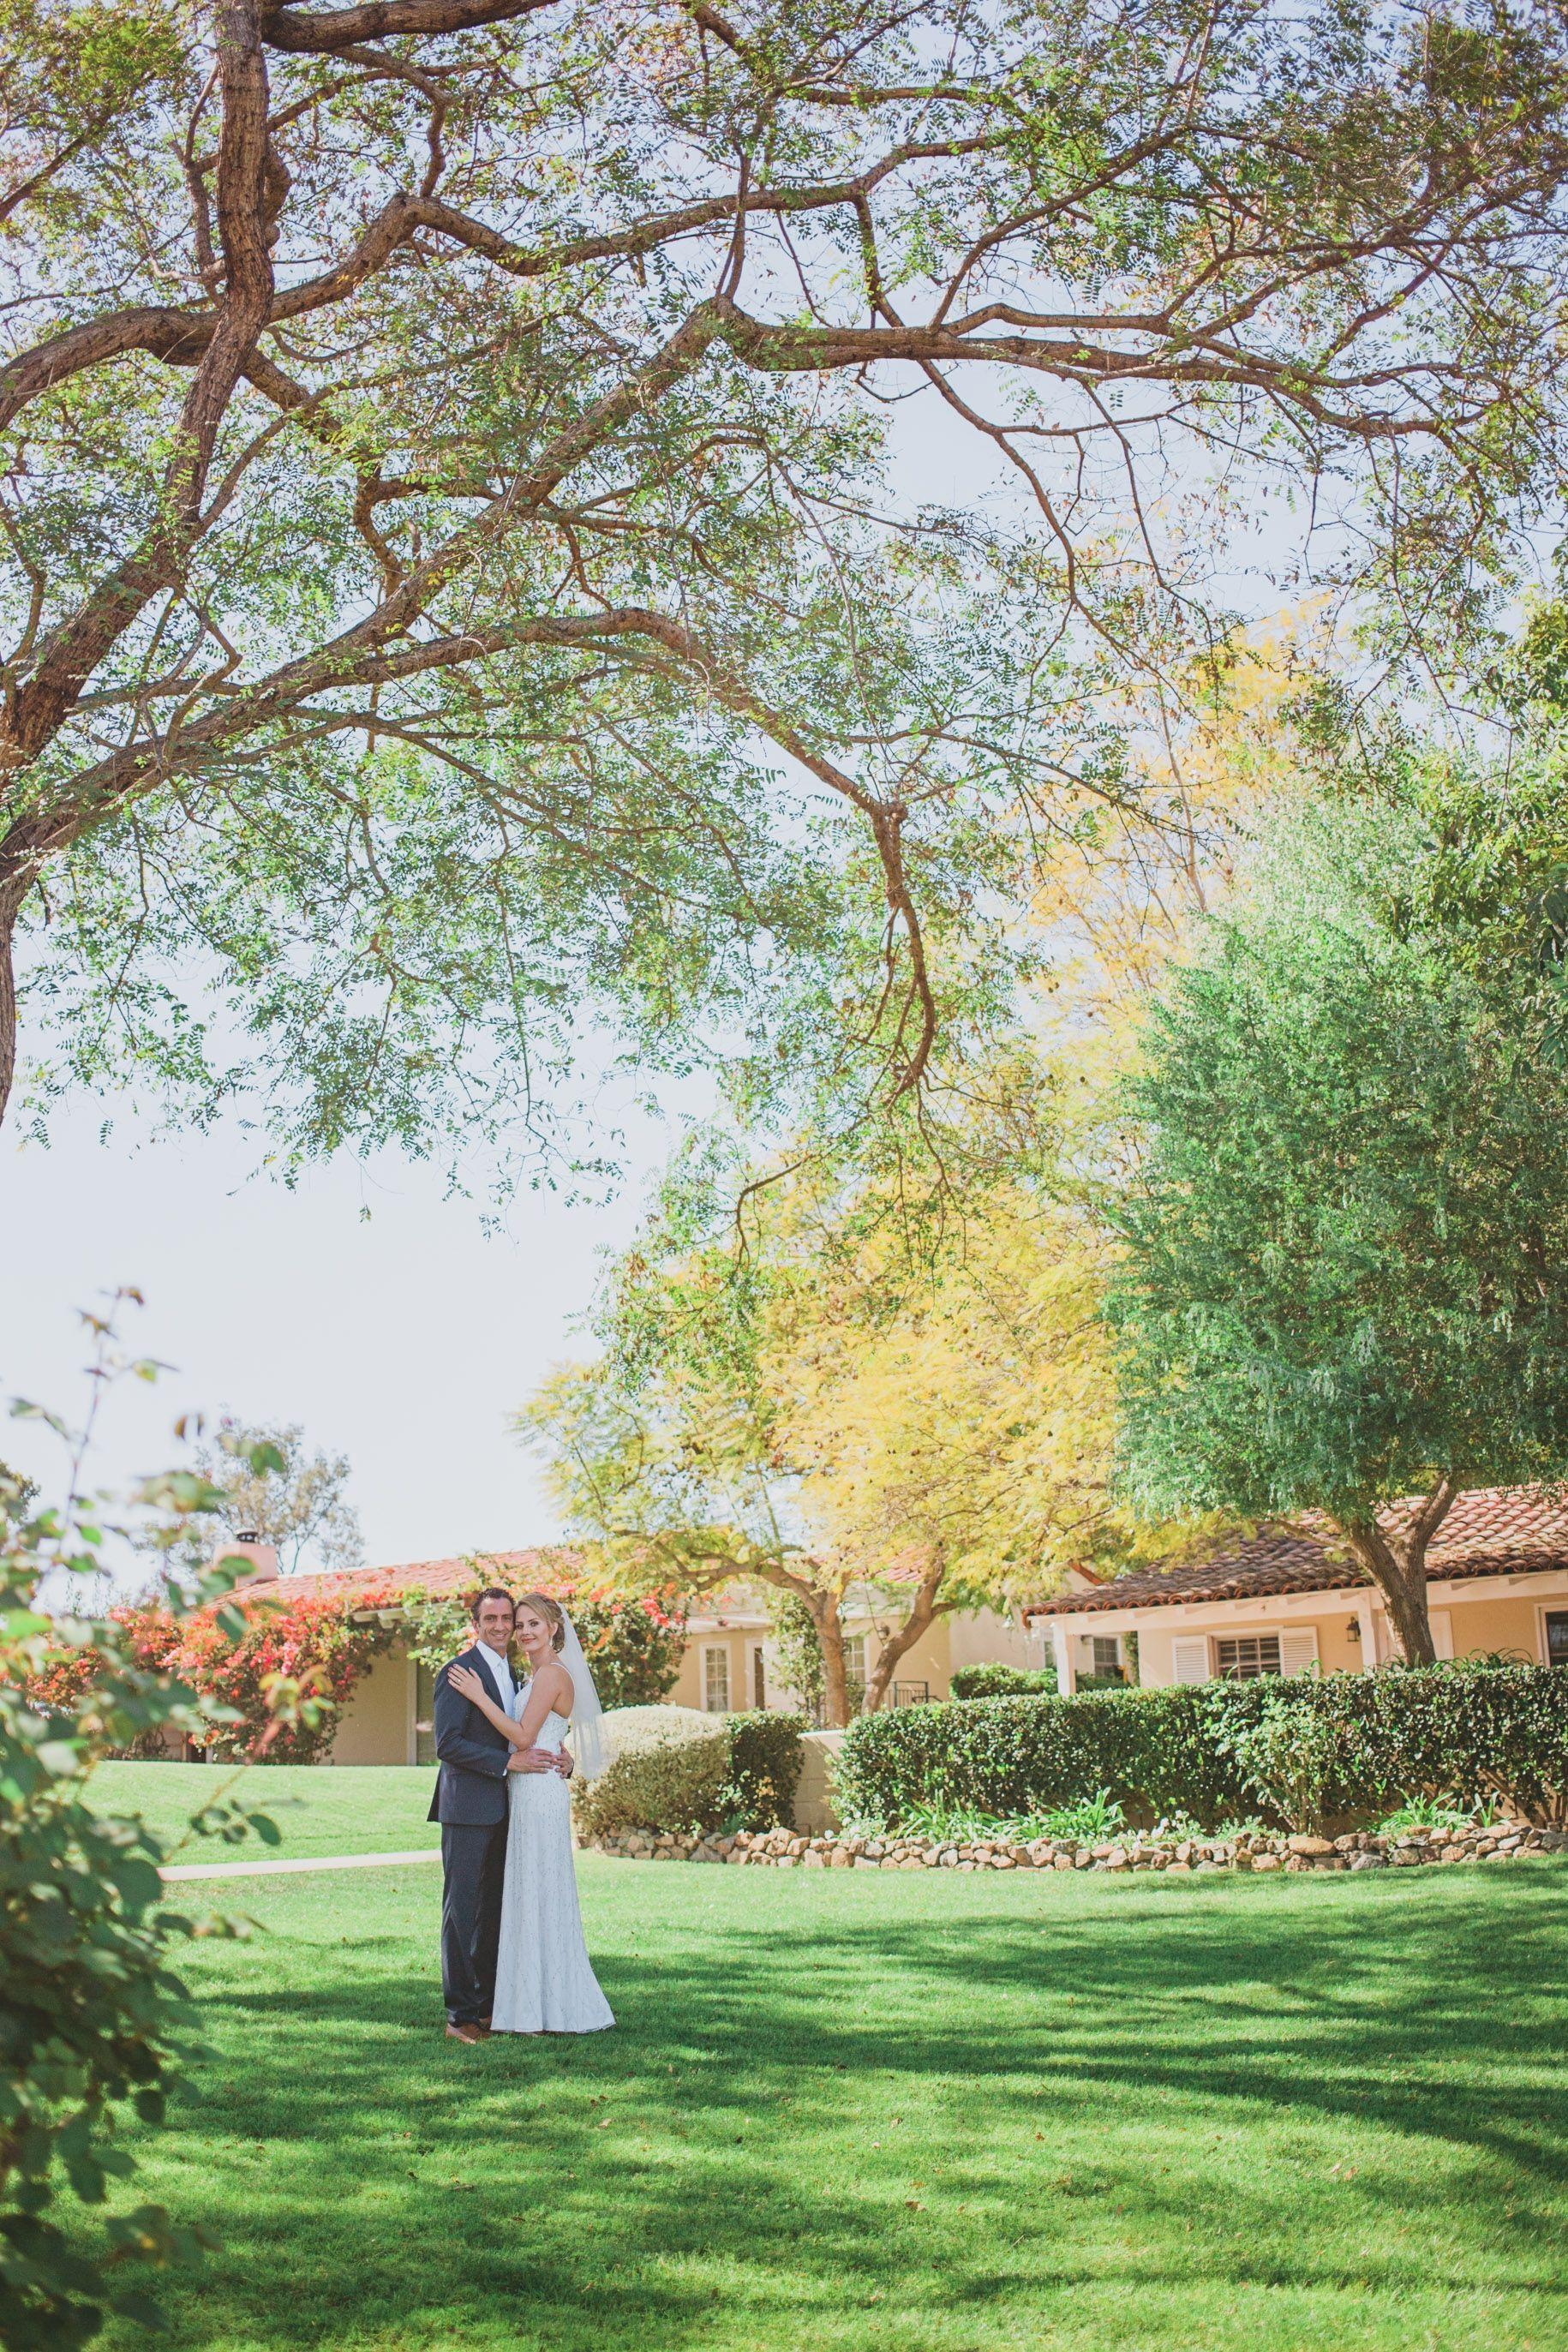 paul and ellie u0027s beautiful backyard wedding photo by studio